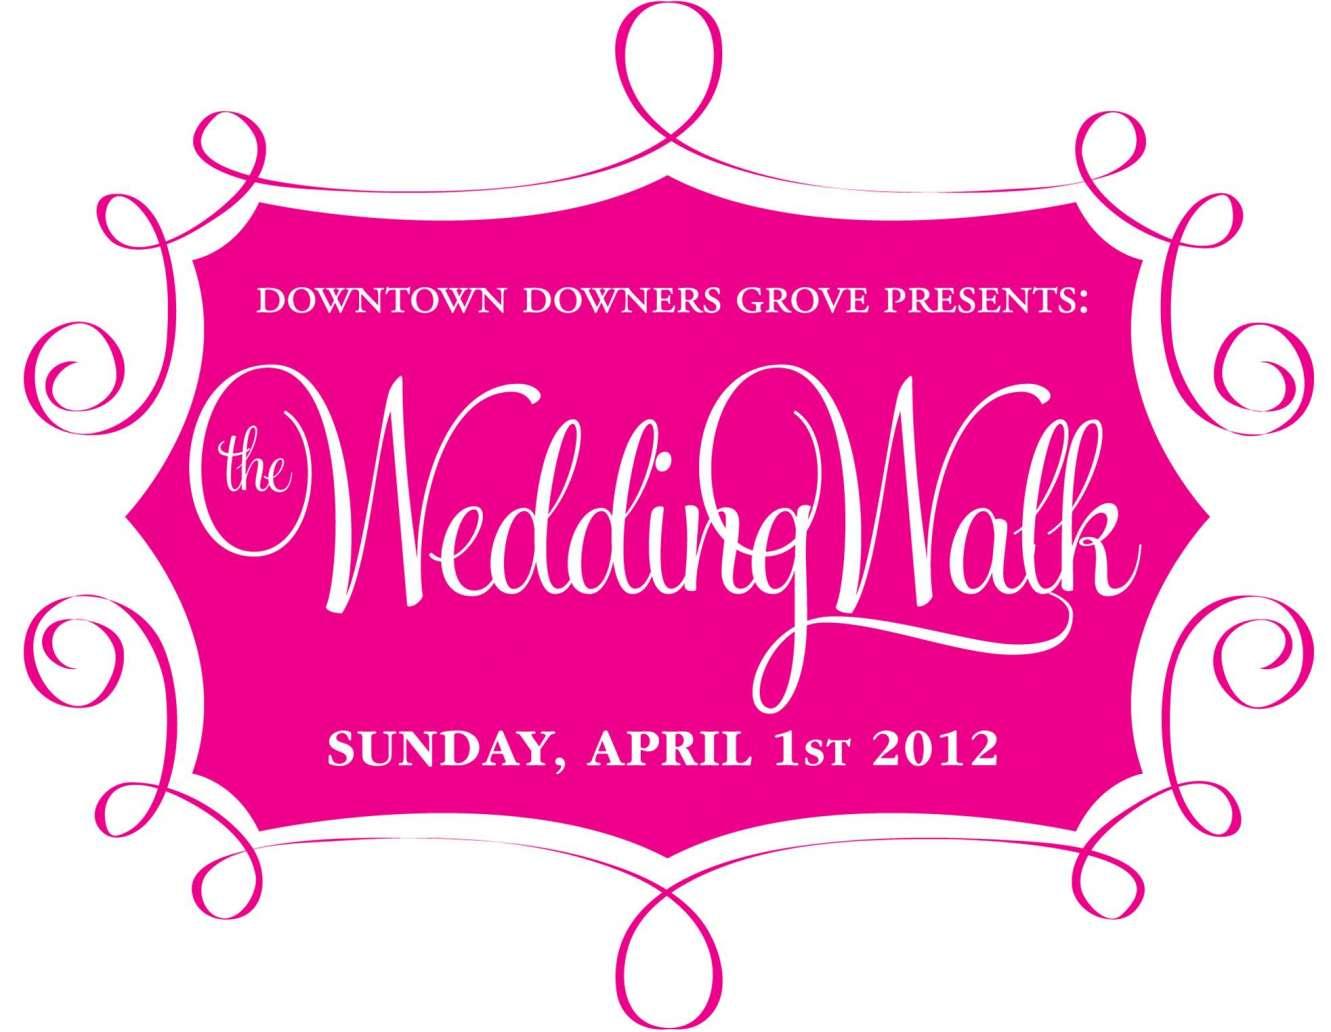 Downtown Downers Grove Wedding Walk, April 1, 2012